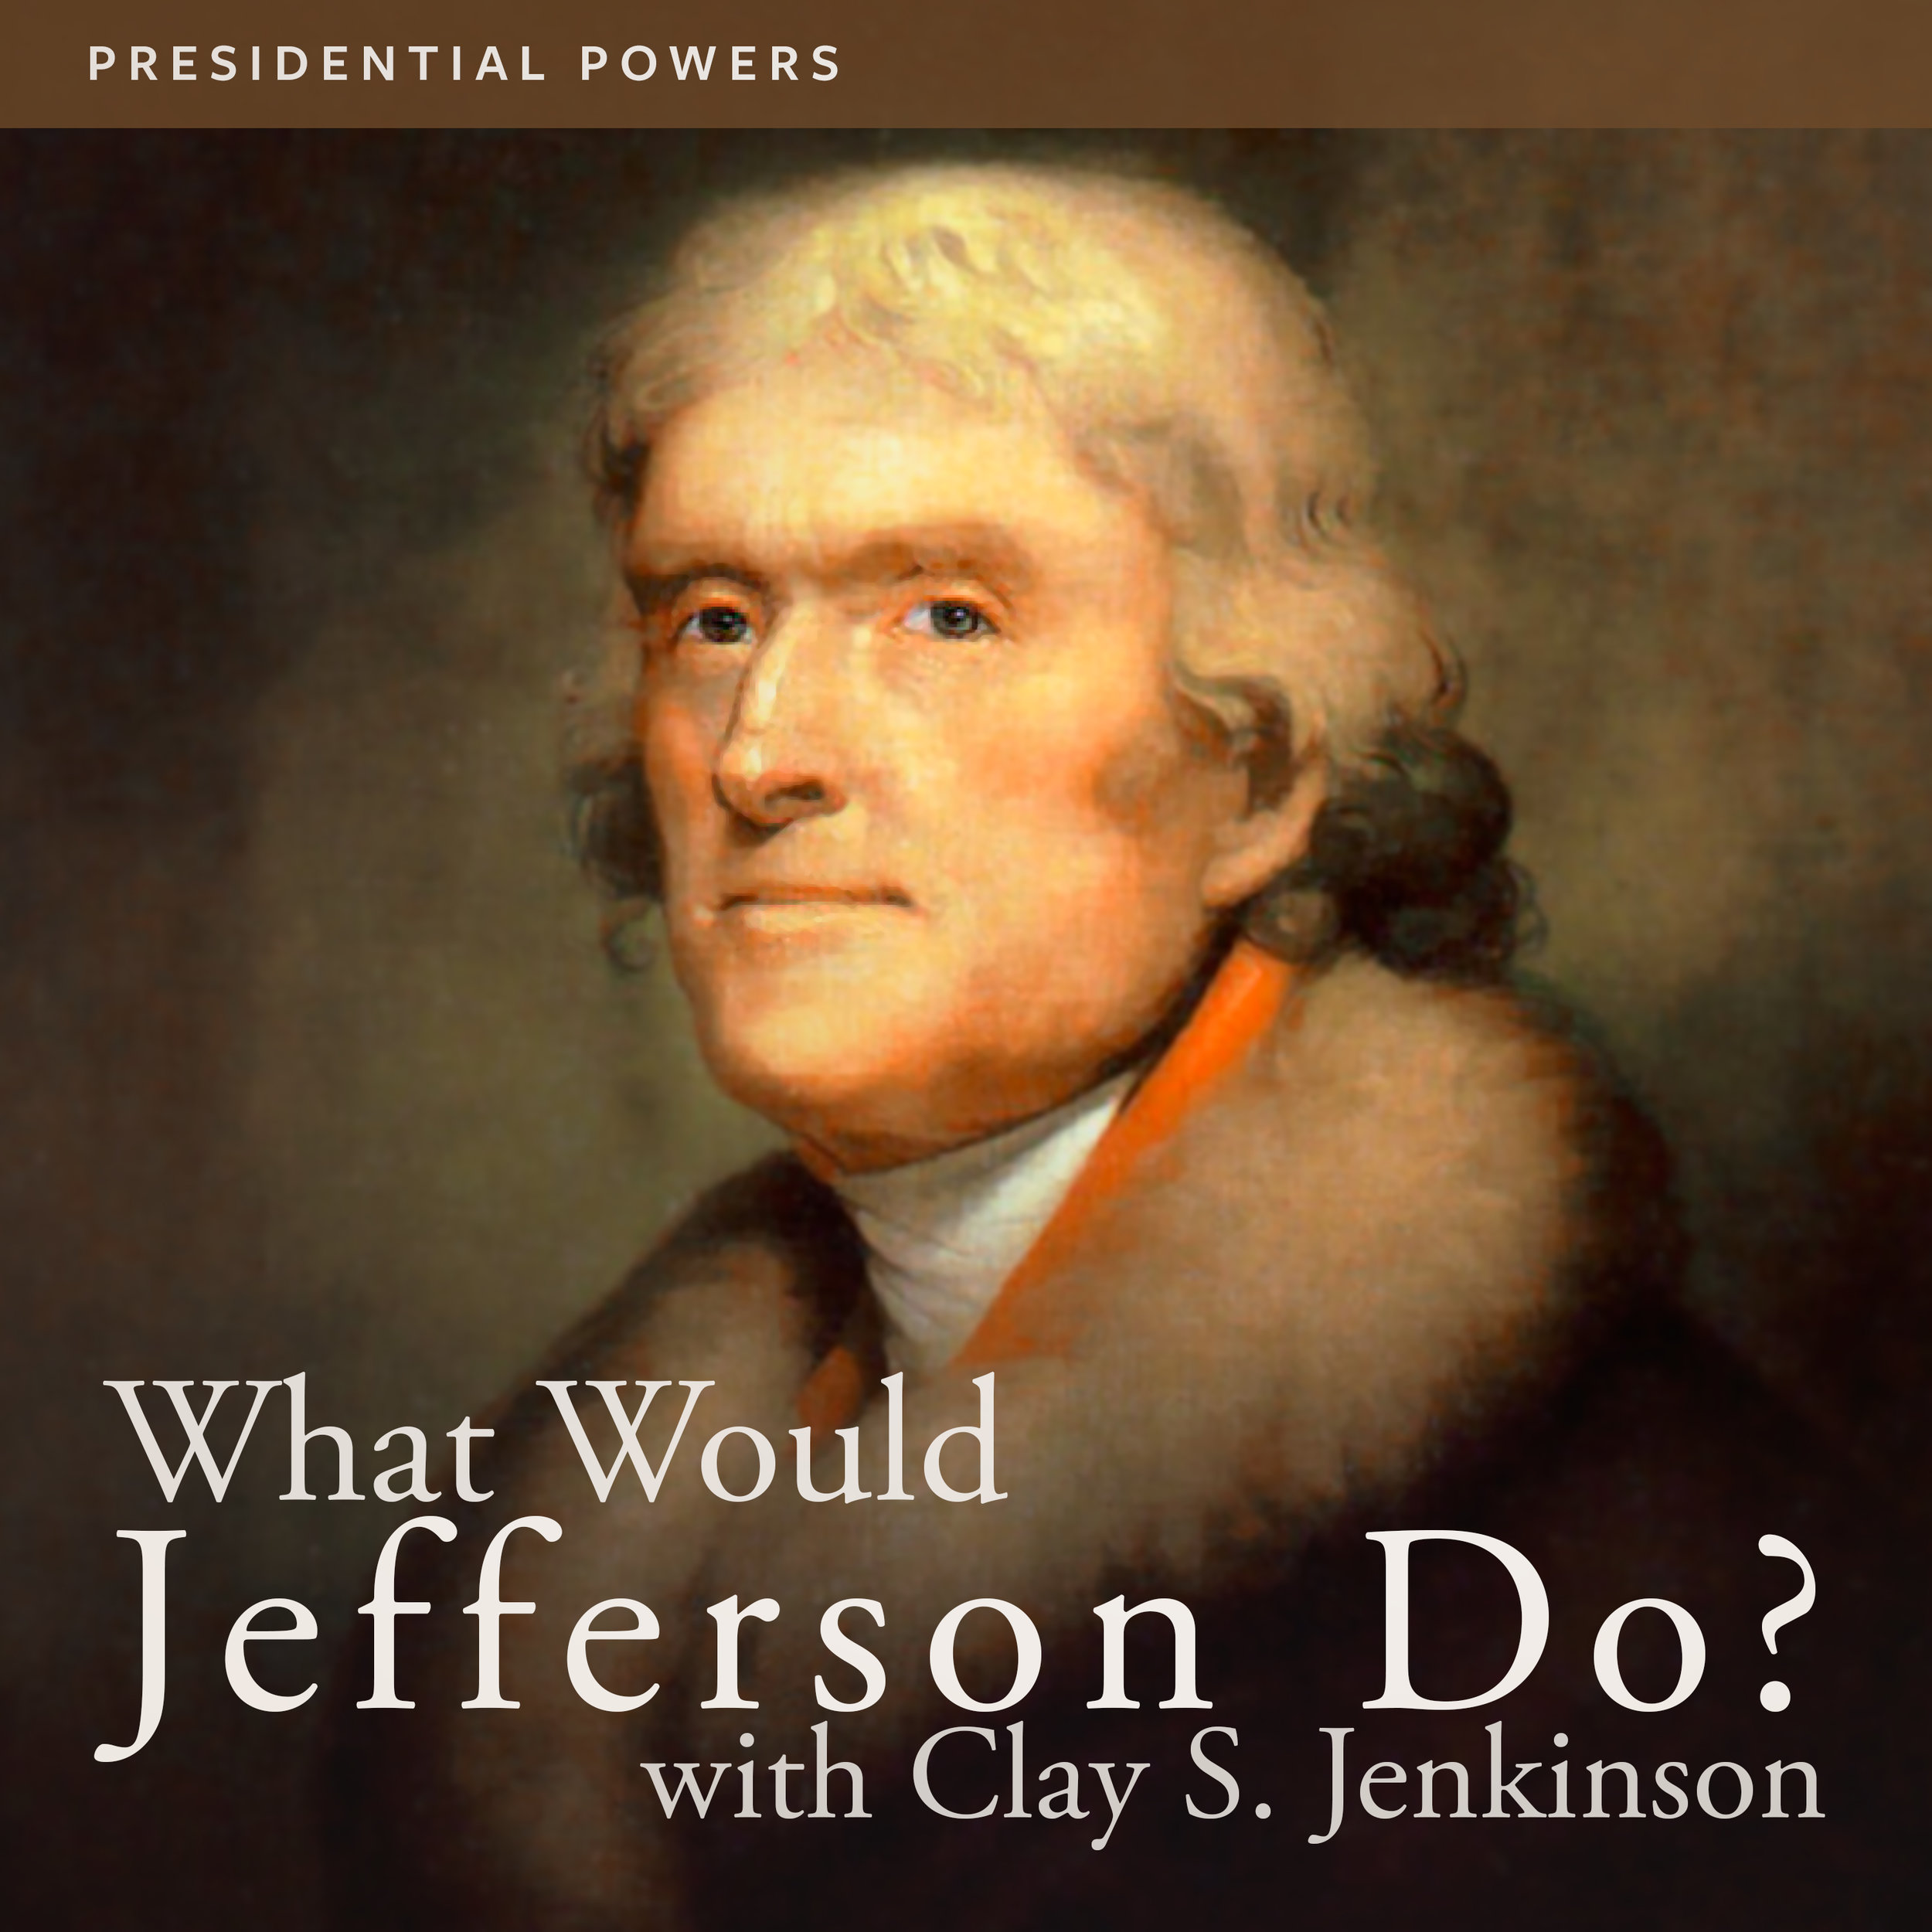 WWTJD_1338 Presidential Powers.jpg